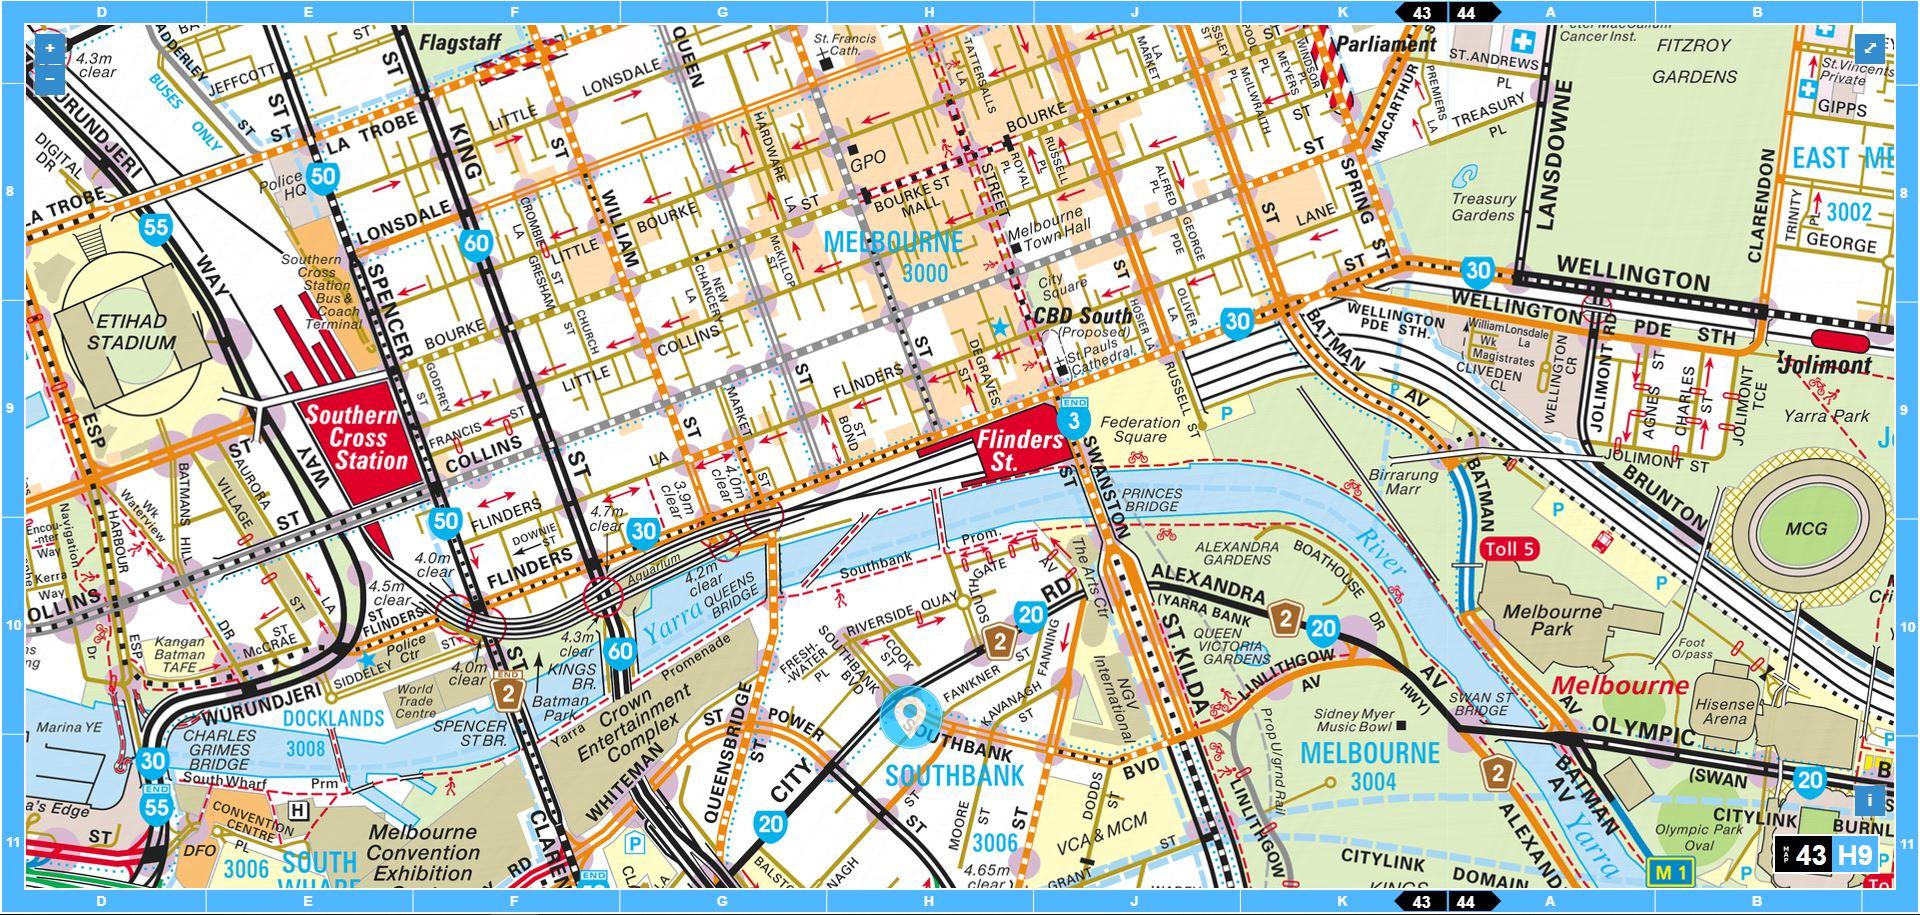 5009 70 Southbank Blvd SOUTHBANK VIC 3006